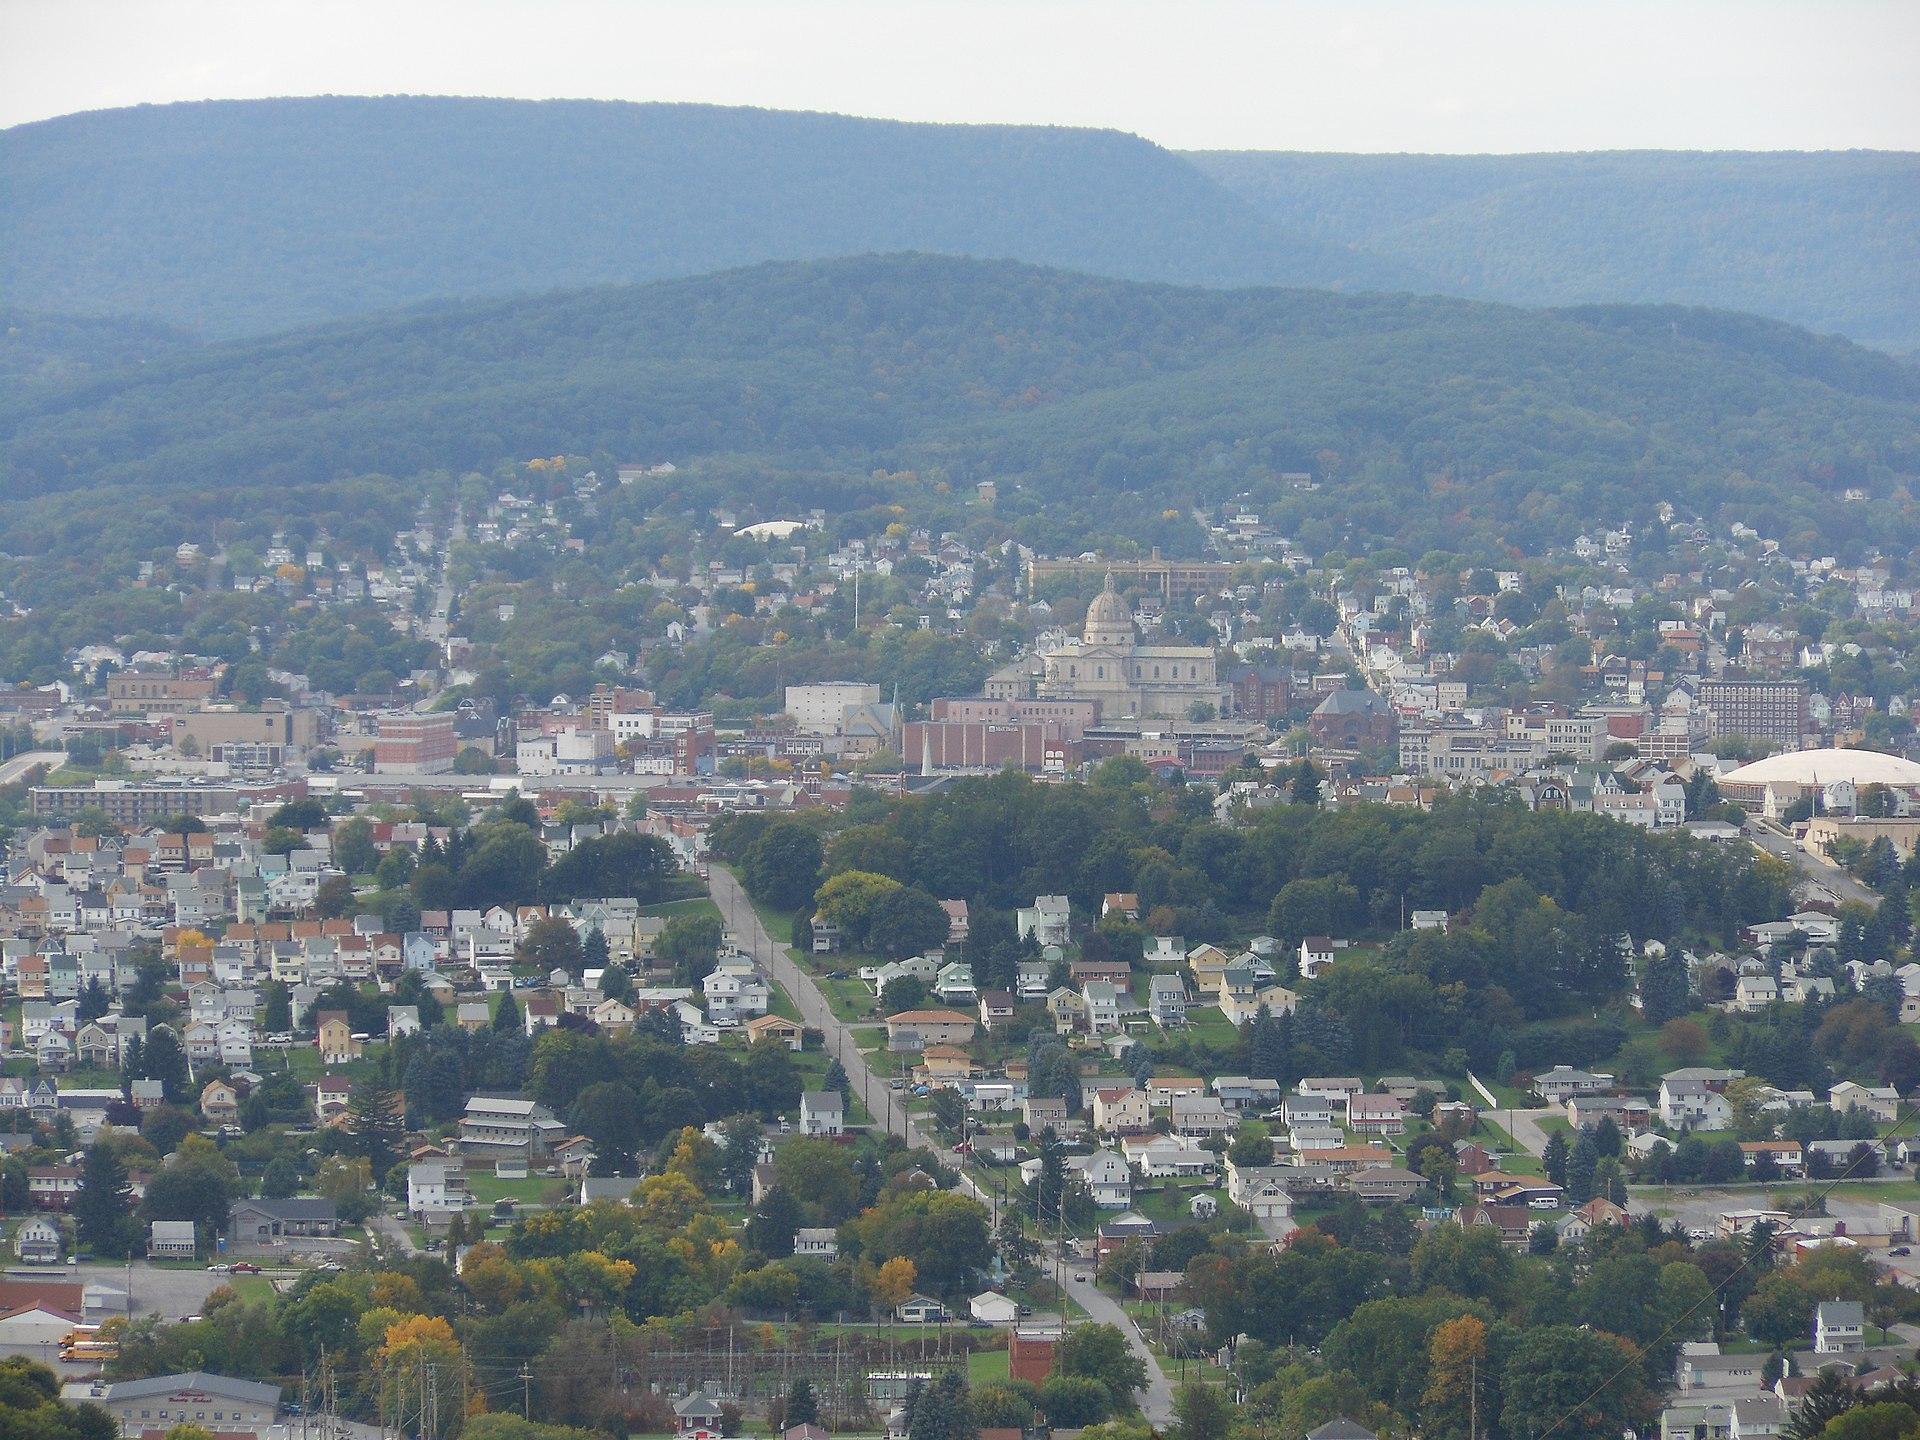 City Of Altoona >> Altoona, Pennsylvania - Wikipedia